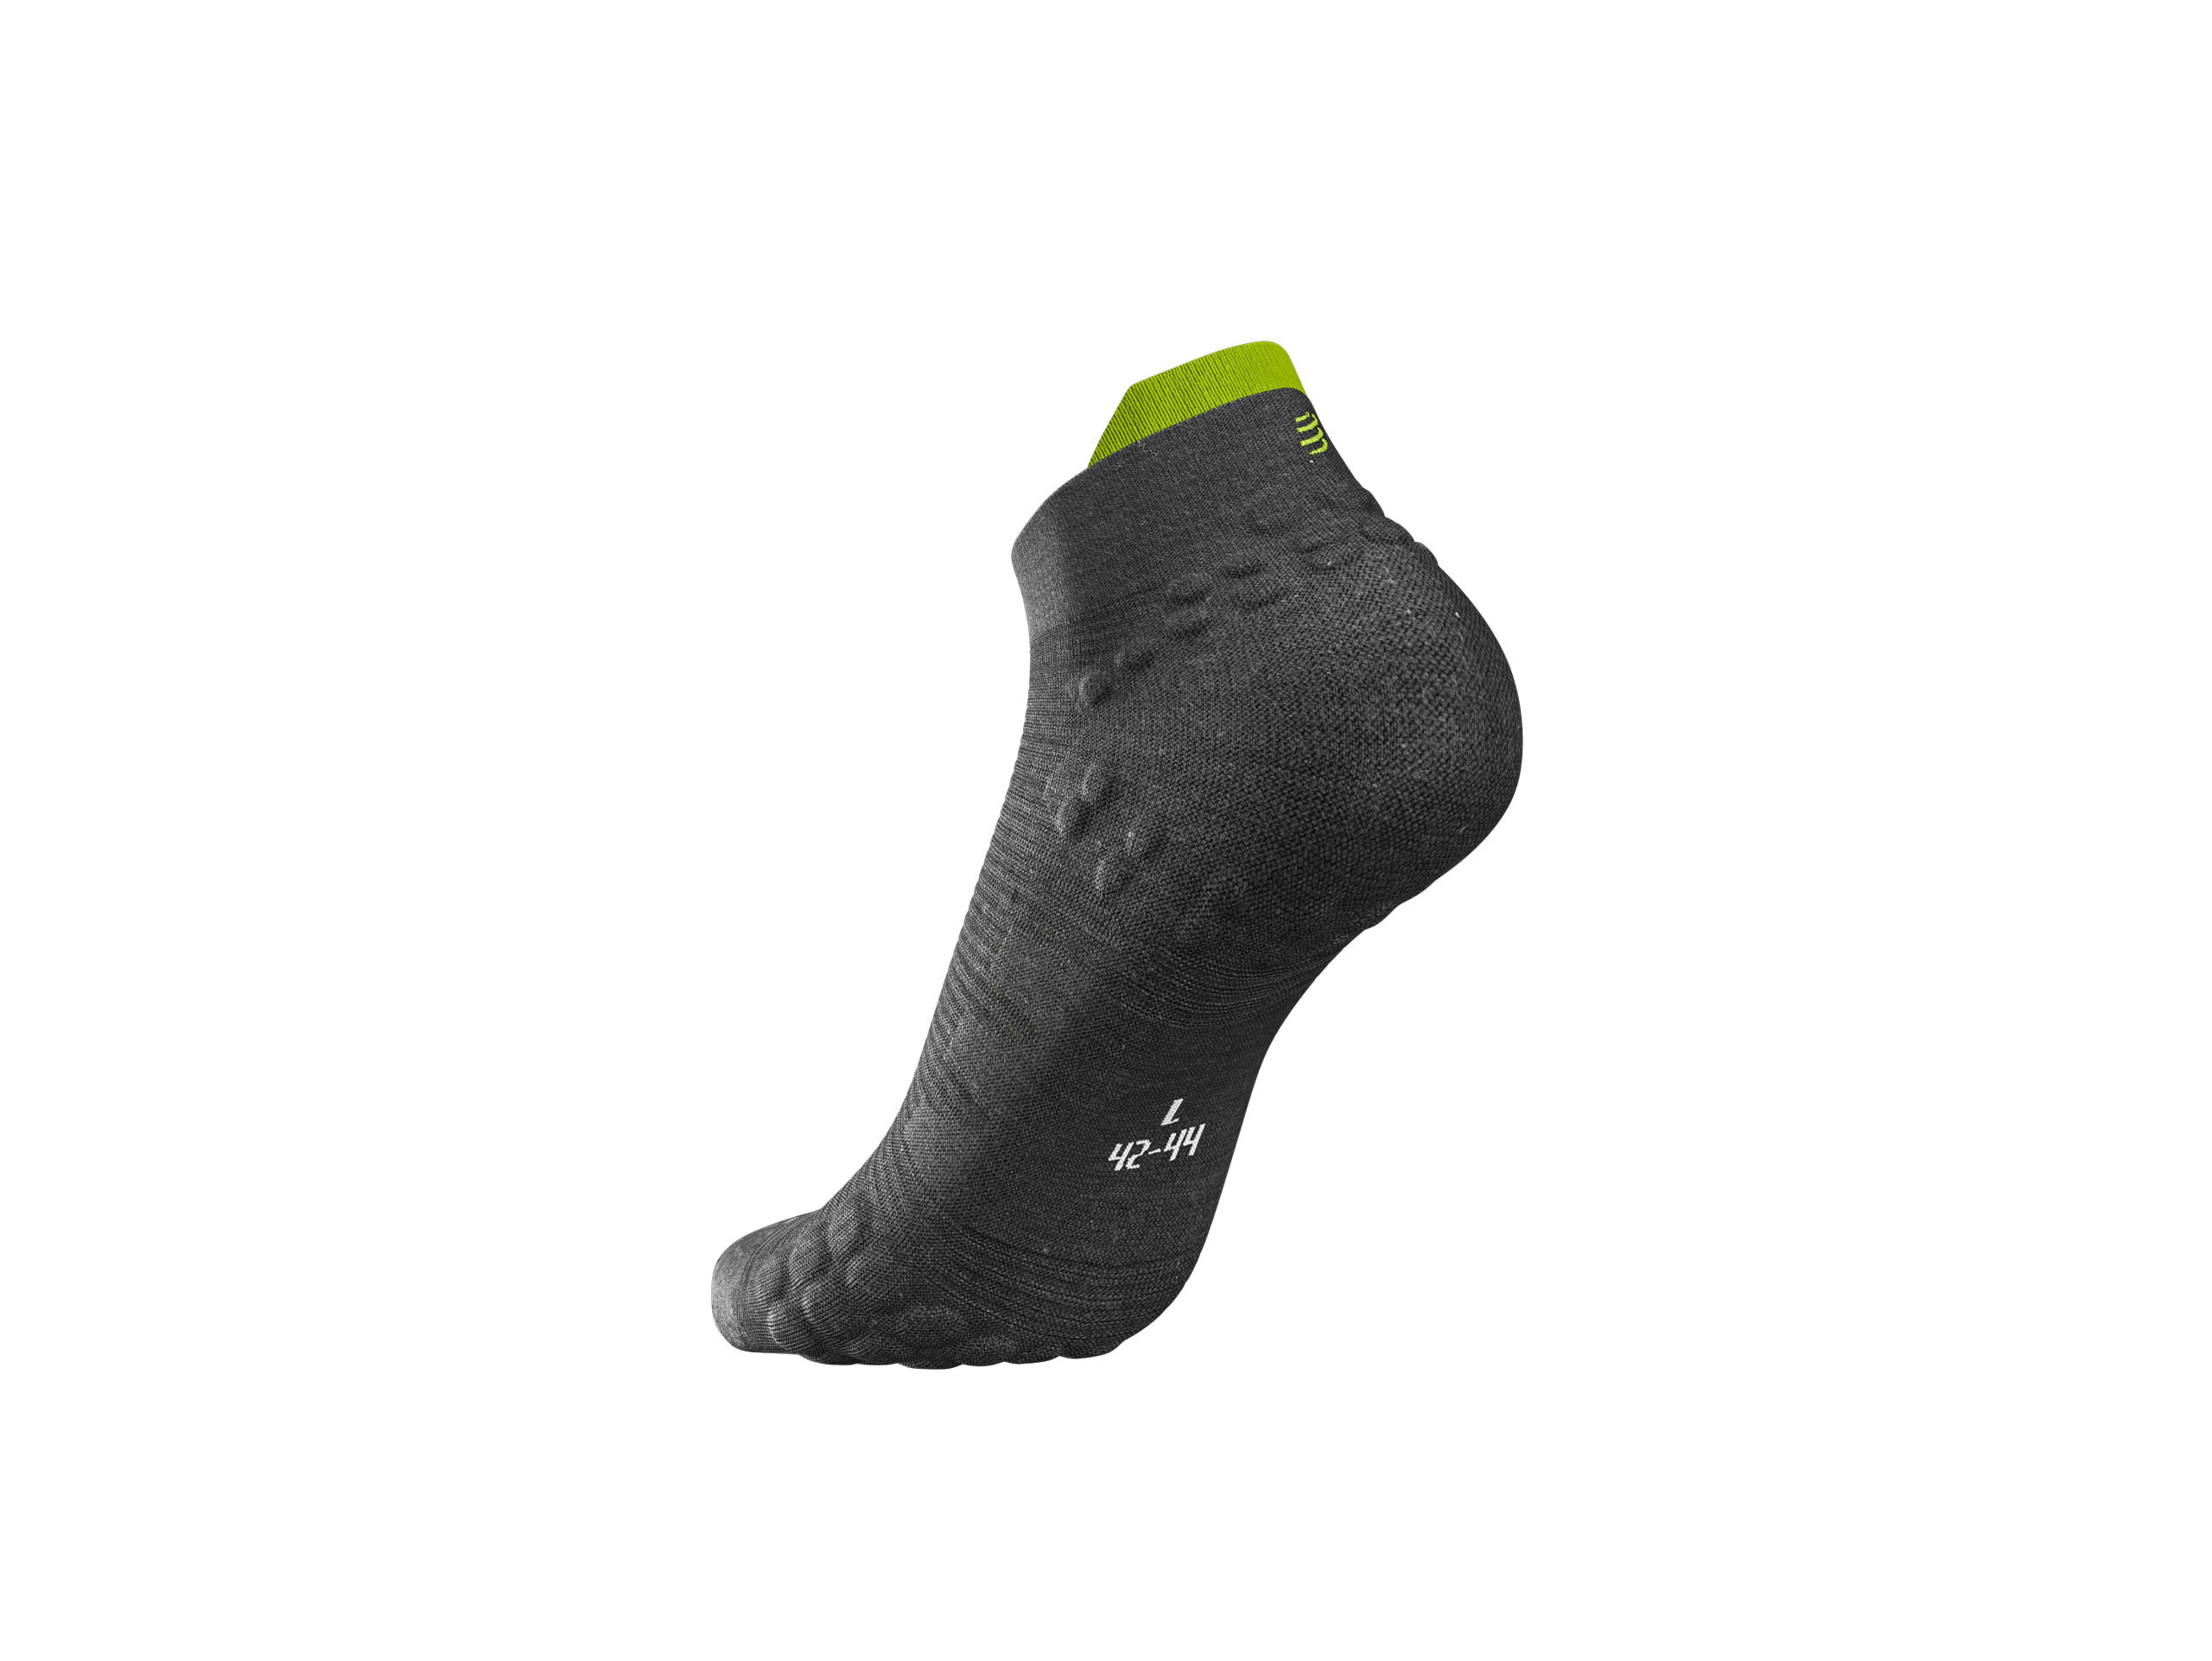 Calcetines deportivos pro v3.0 Run Low - Black Edition 2019